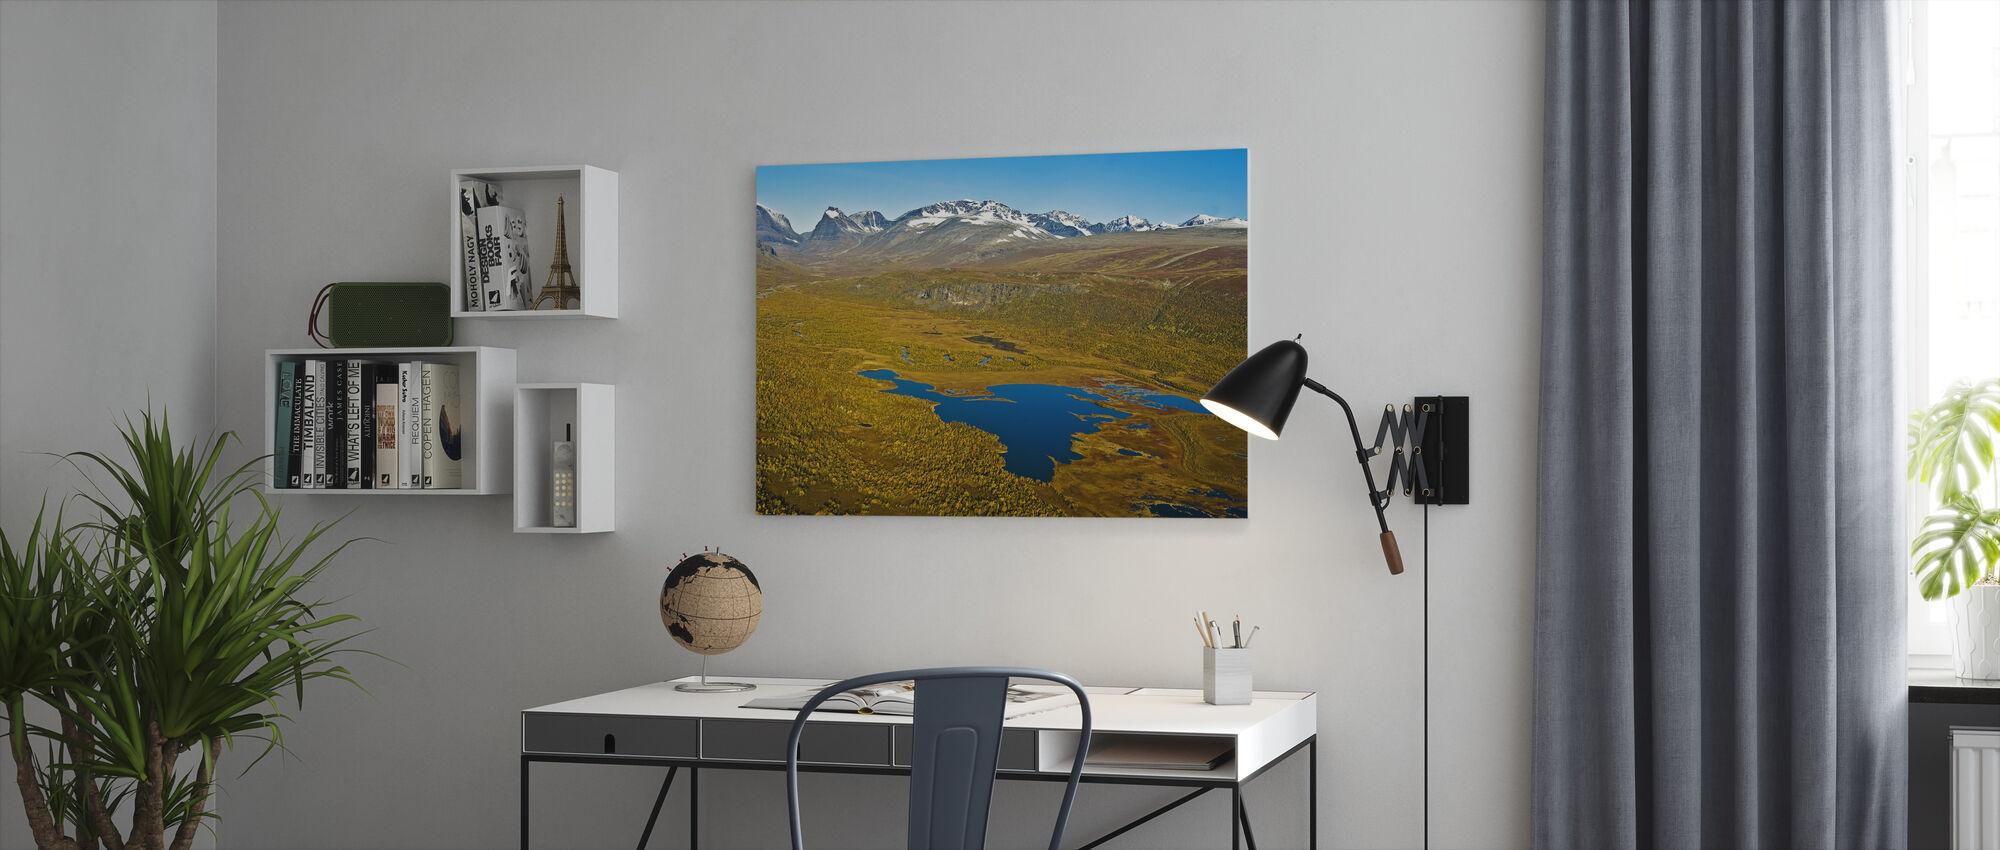 Lapland - Canvas print - Office